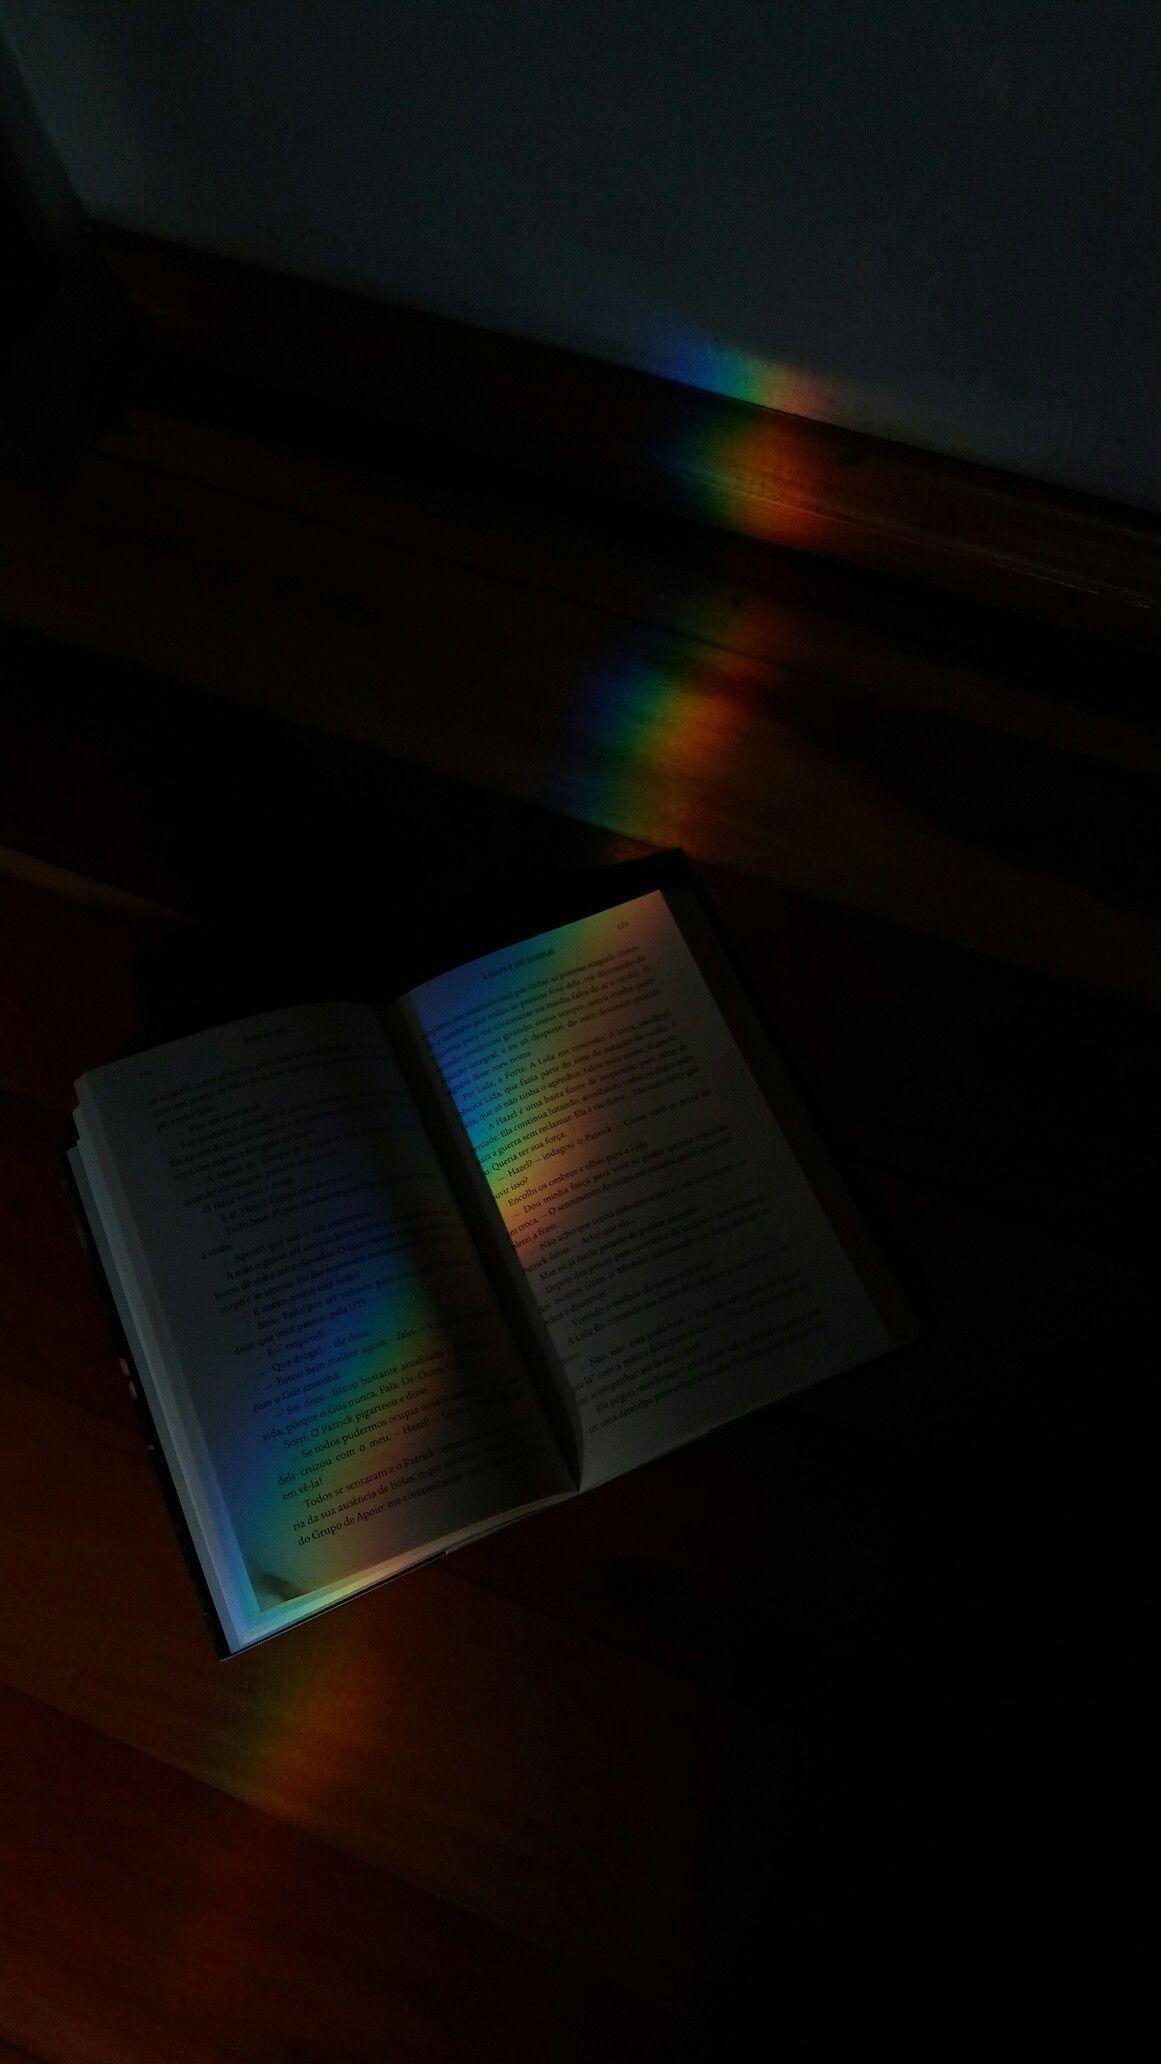 Pin by 𝕓𝕠𝕘 𝕞𝕦𝕞𝕞𝕪 on ️~♡~ | Rainbow aesthetic, Rainbow ...